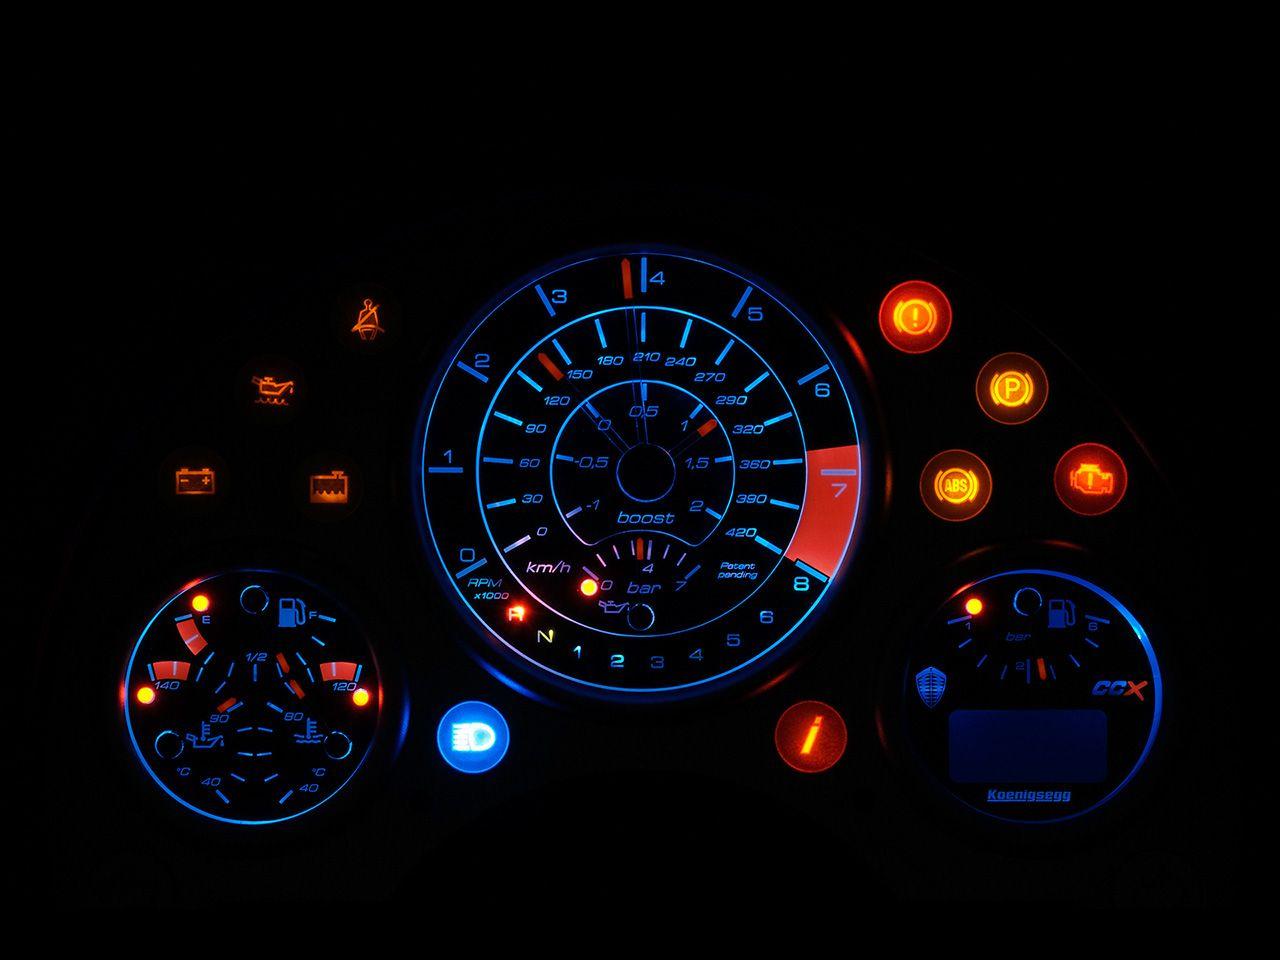 Cars Vehicles Dashboards Speedometer 1280x960 Wallpaper